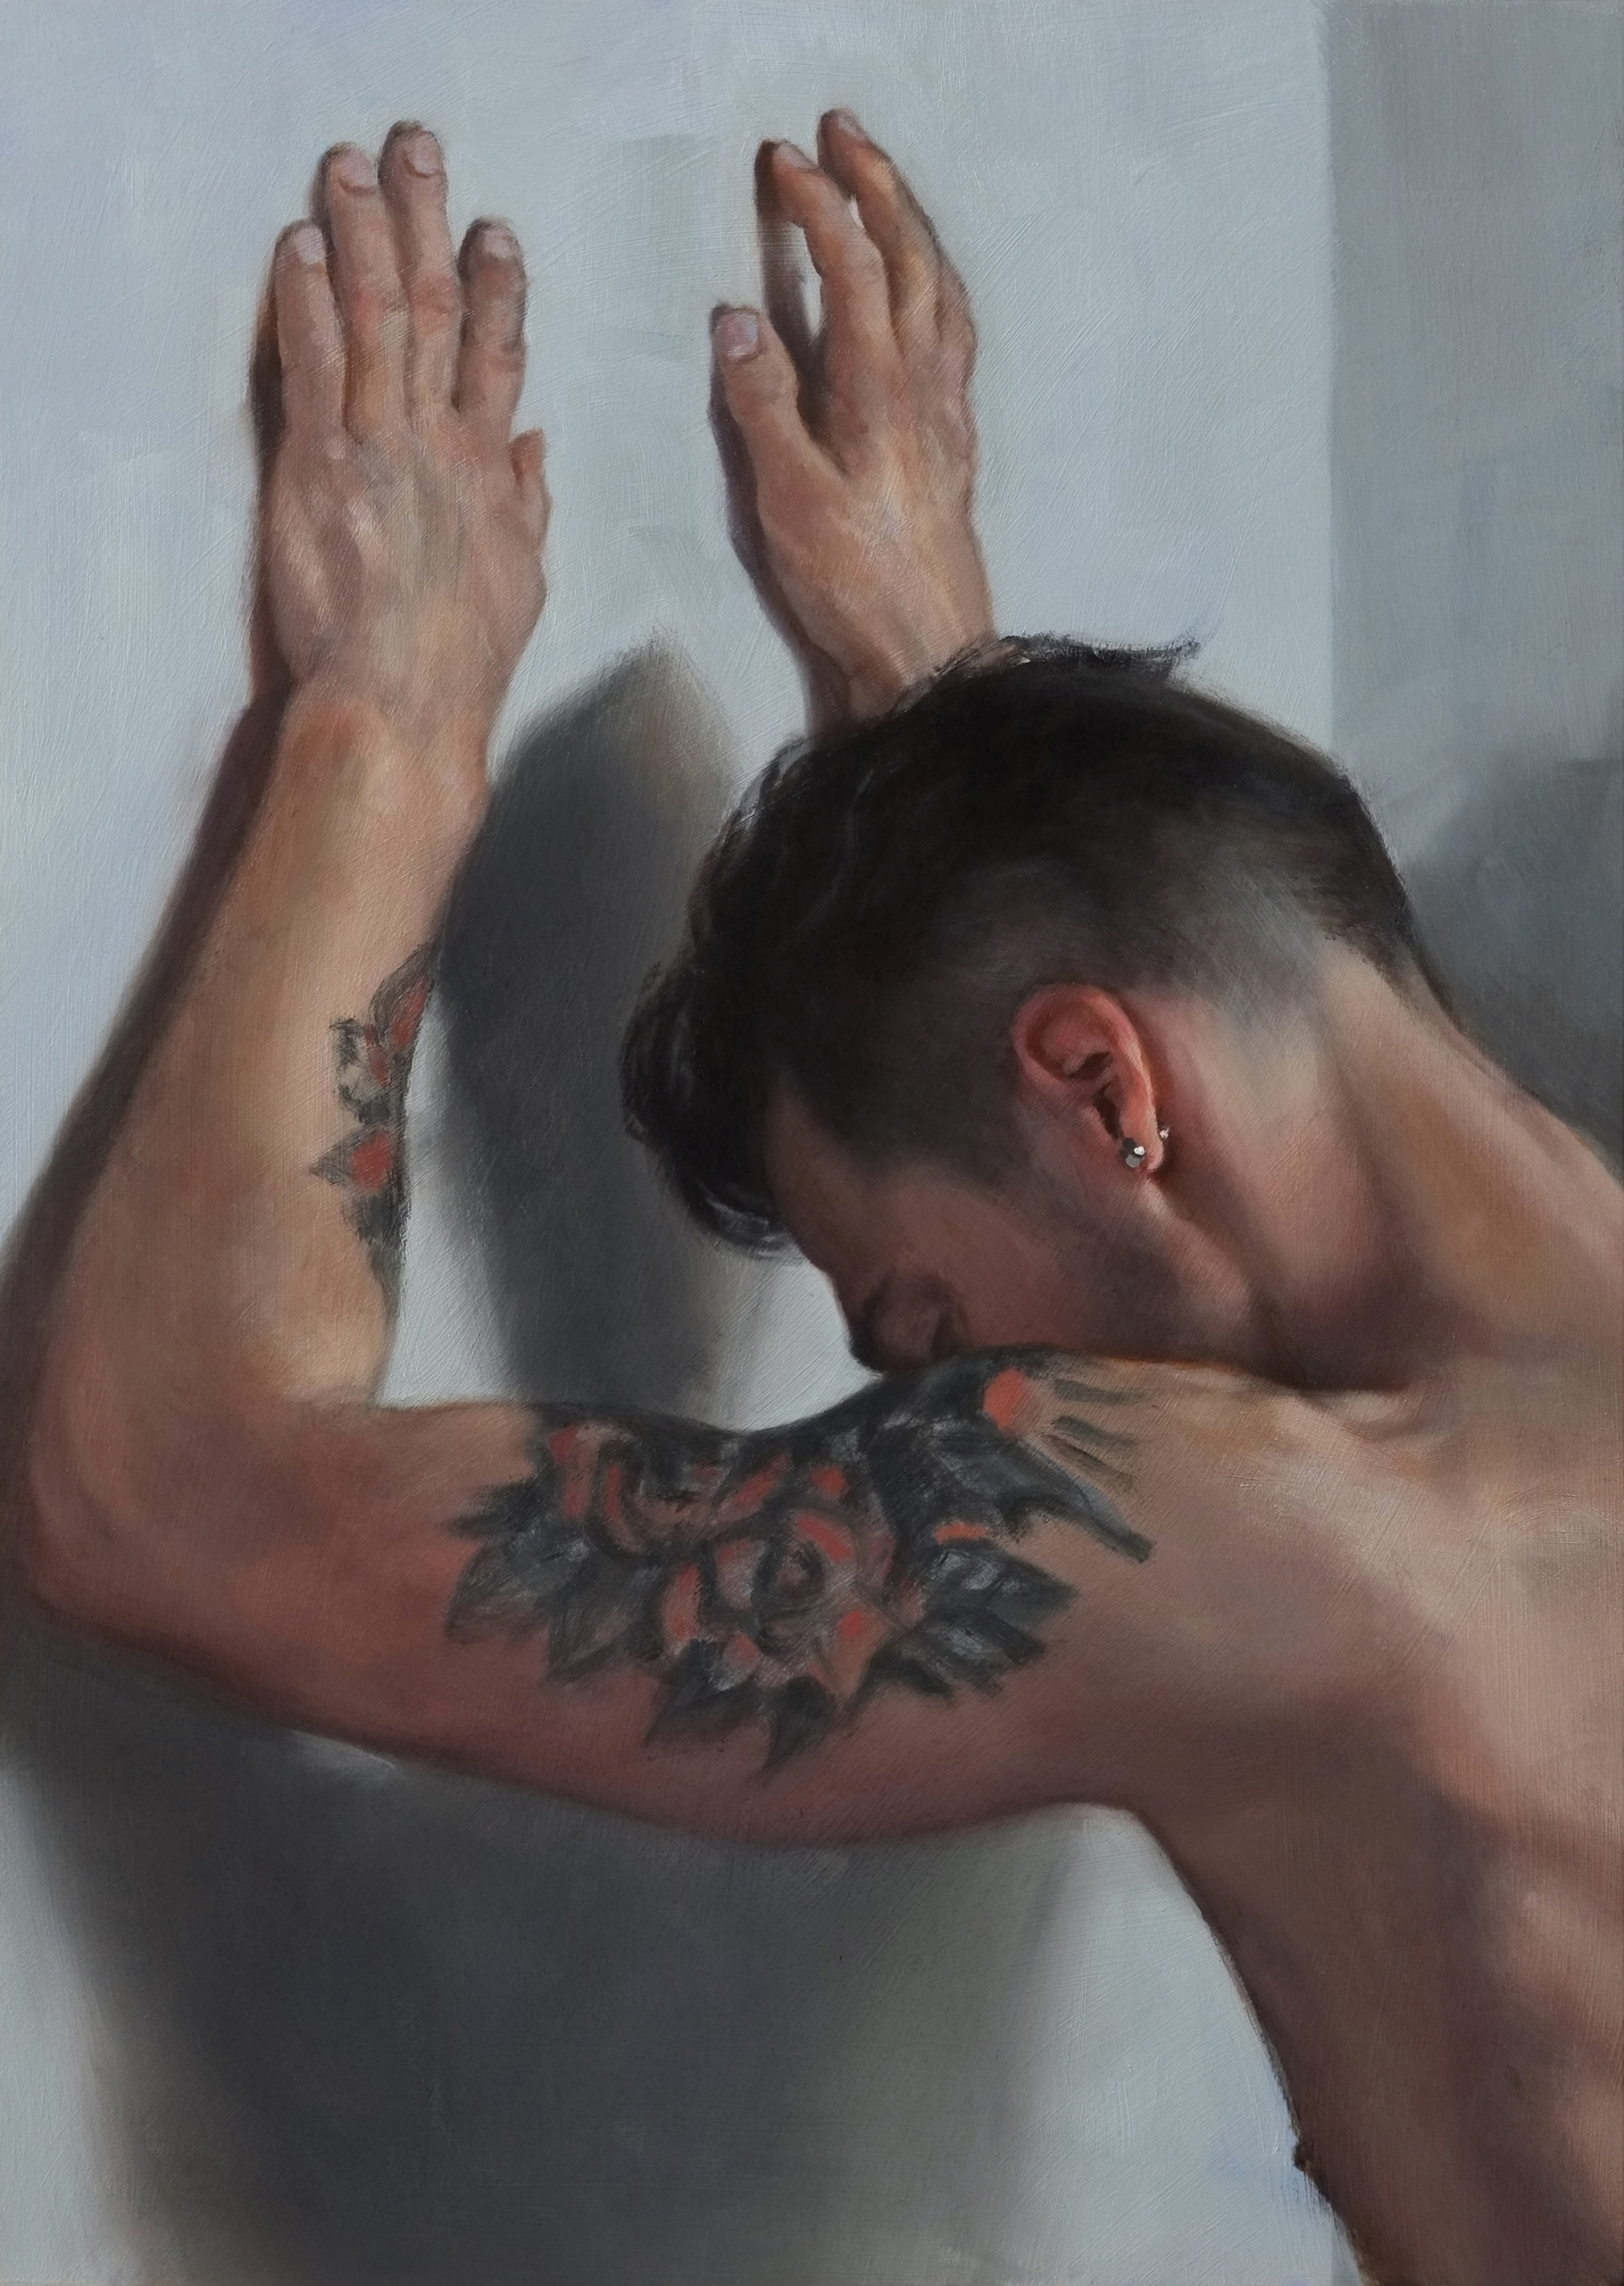 Oil Painting - hashtagartmag | ello